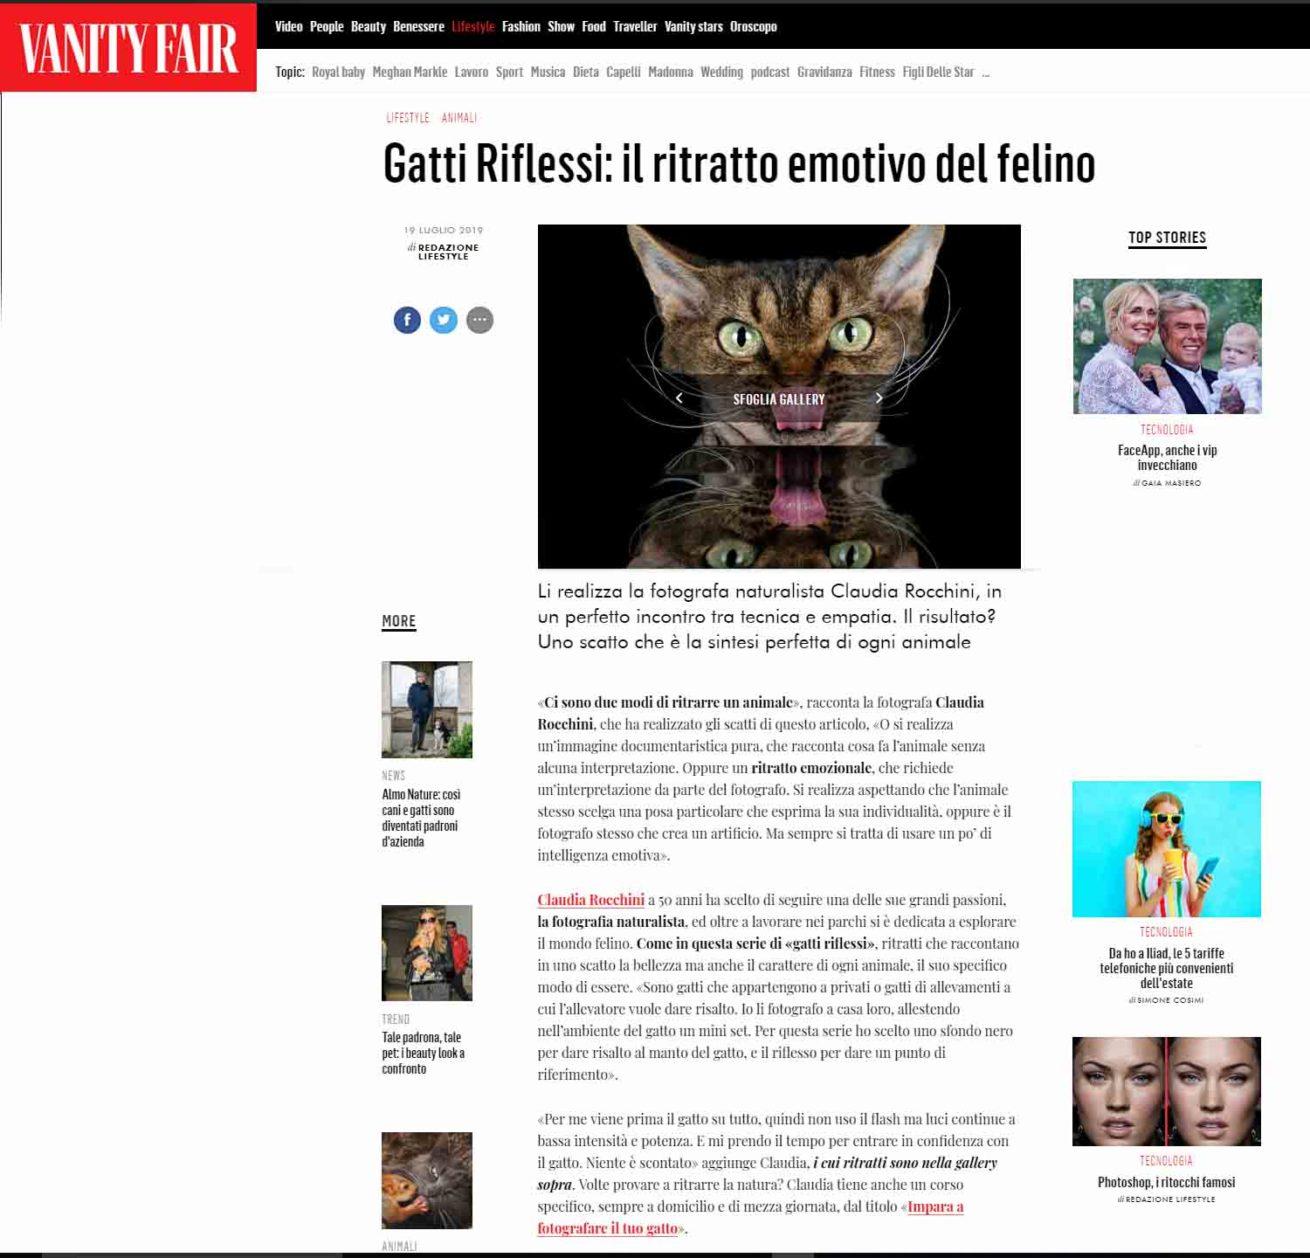 rocchini gatti vanity fair